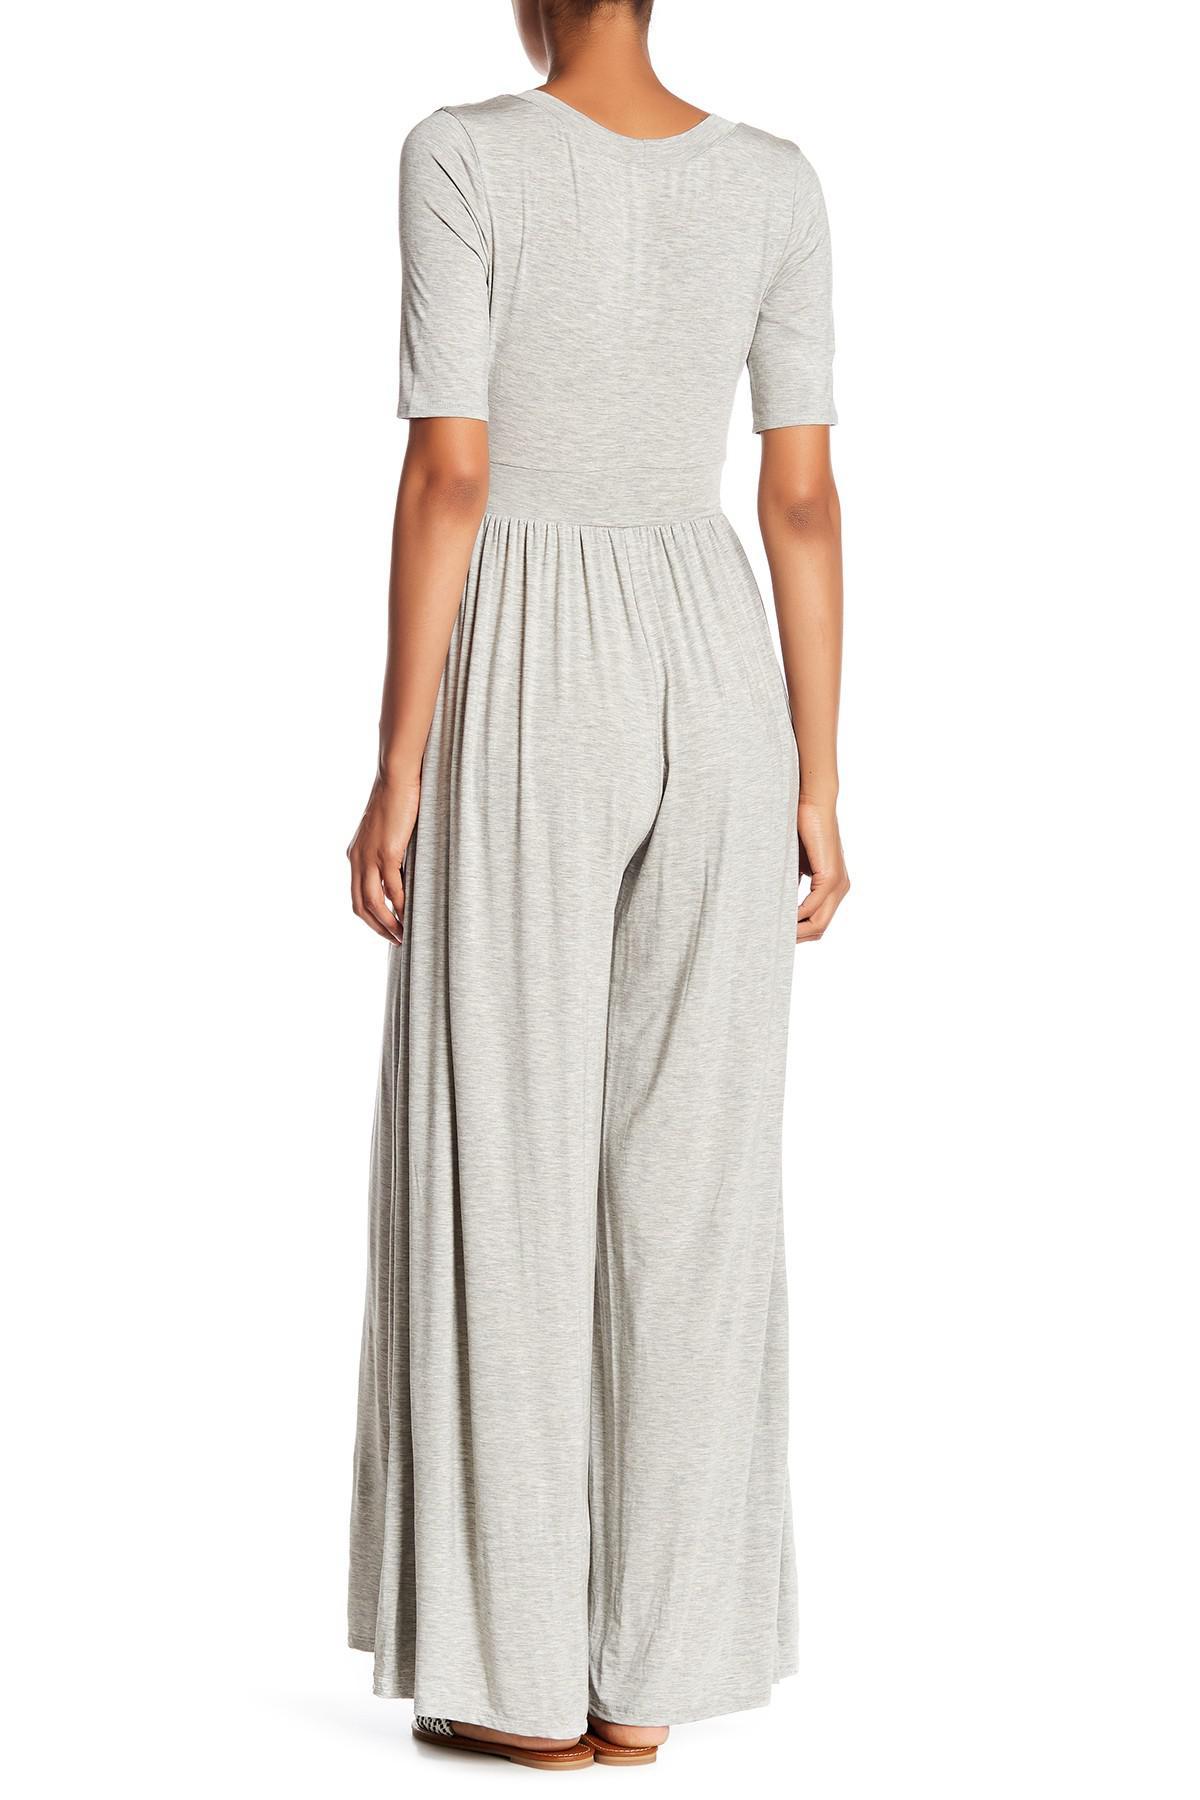 833251c2a329 West Kei - Gray Knit Wide Leg Jumpsuit - Lyst. View fullscreen